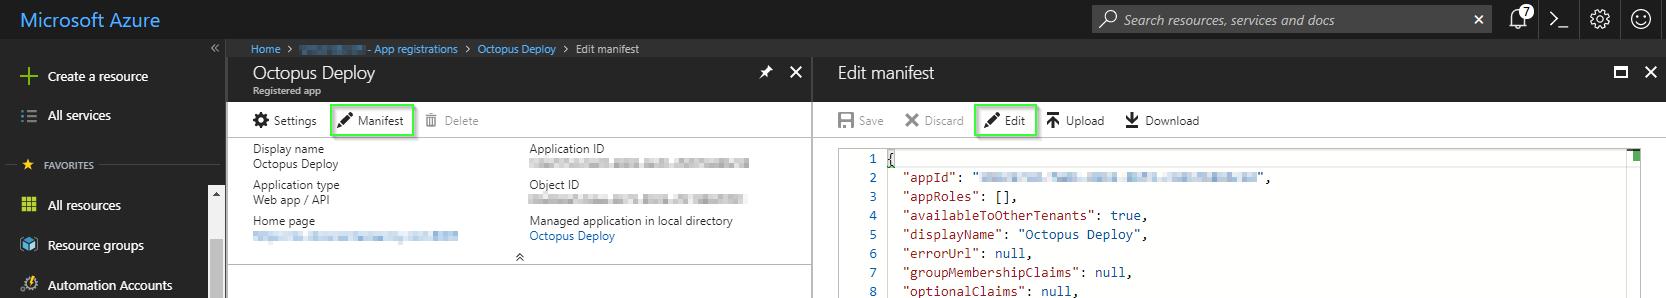 Editing an App registration manifest